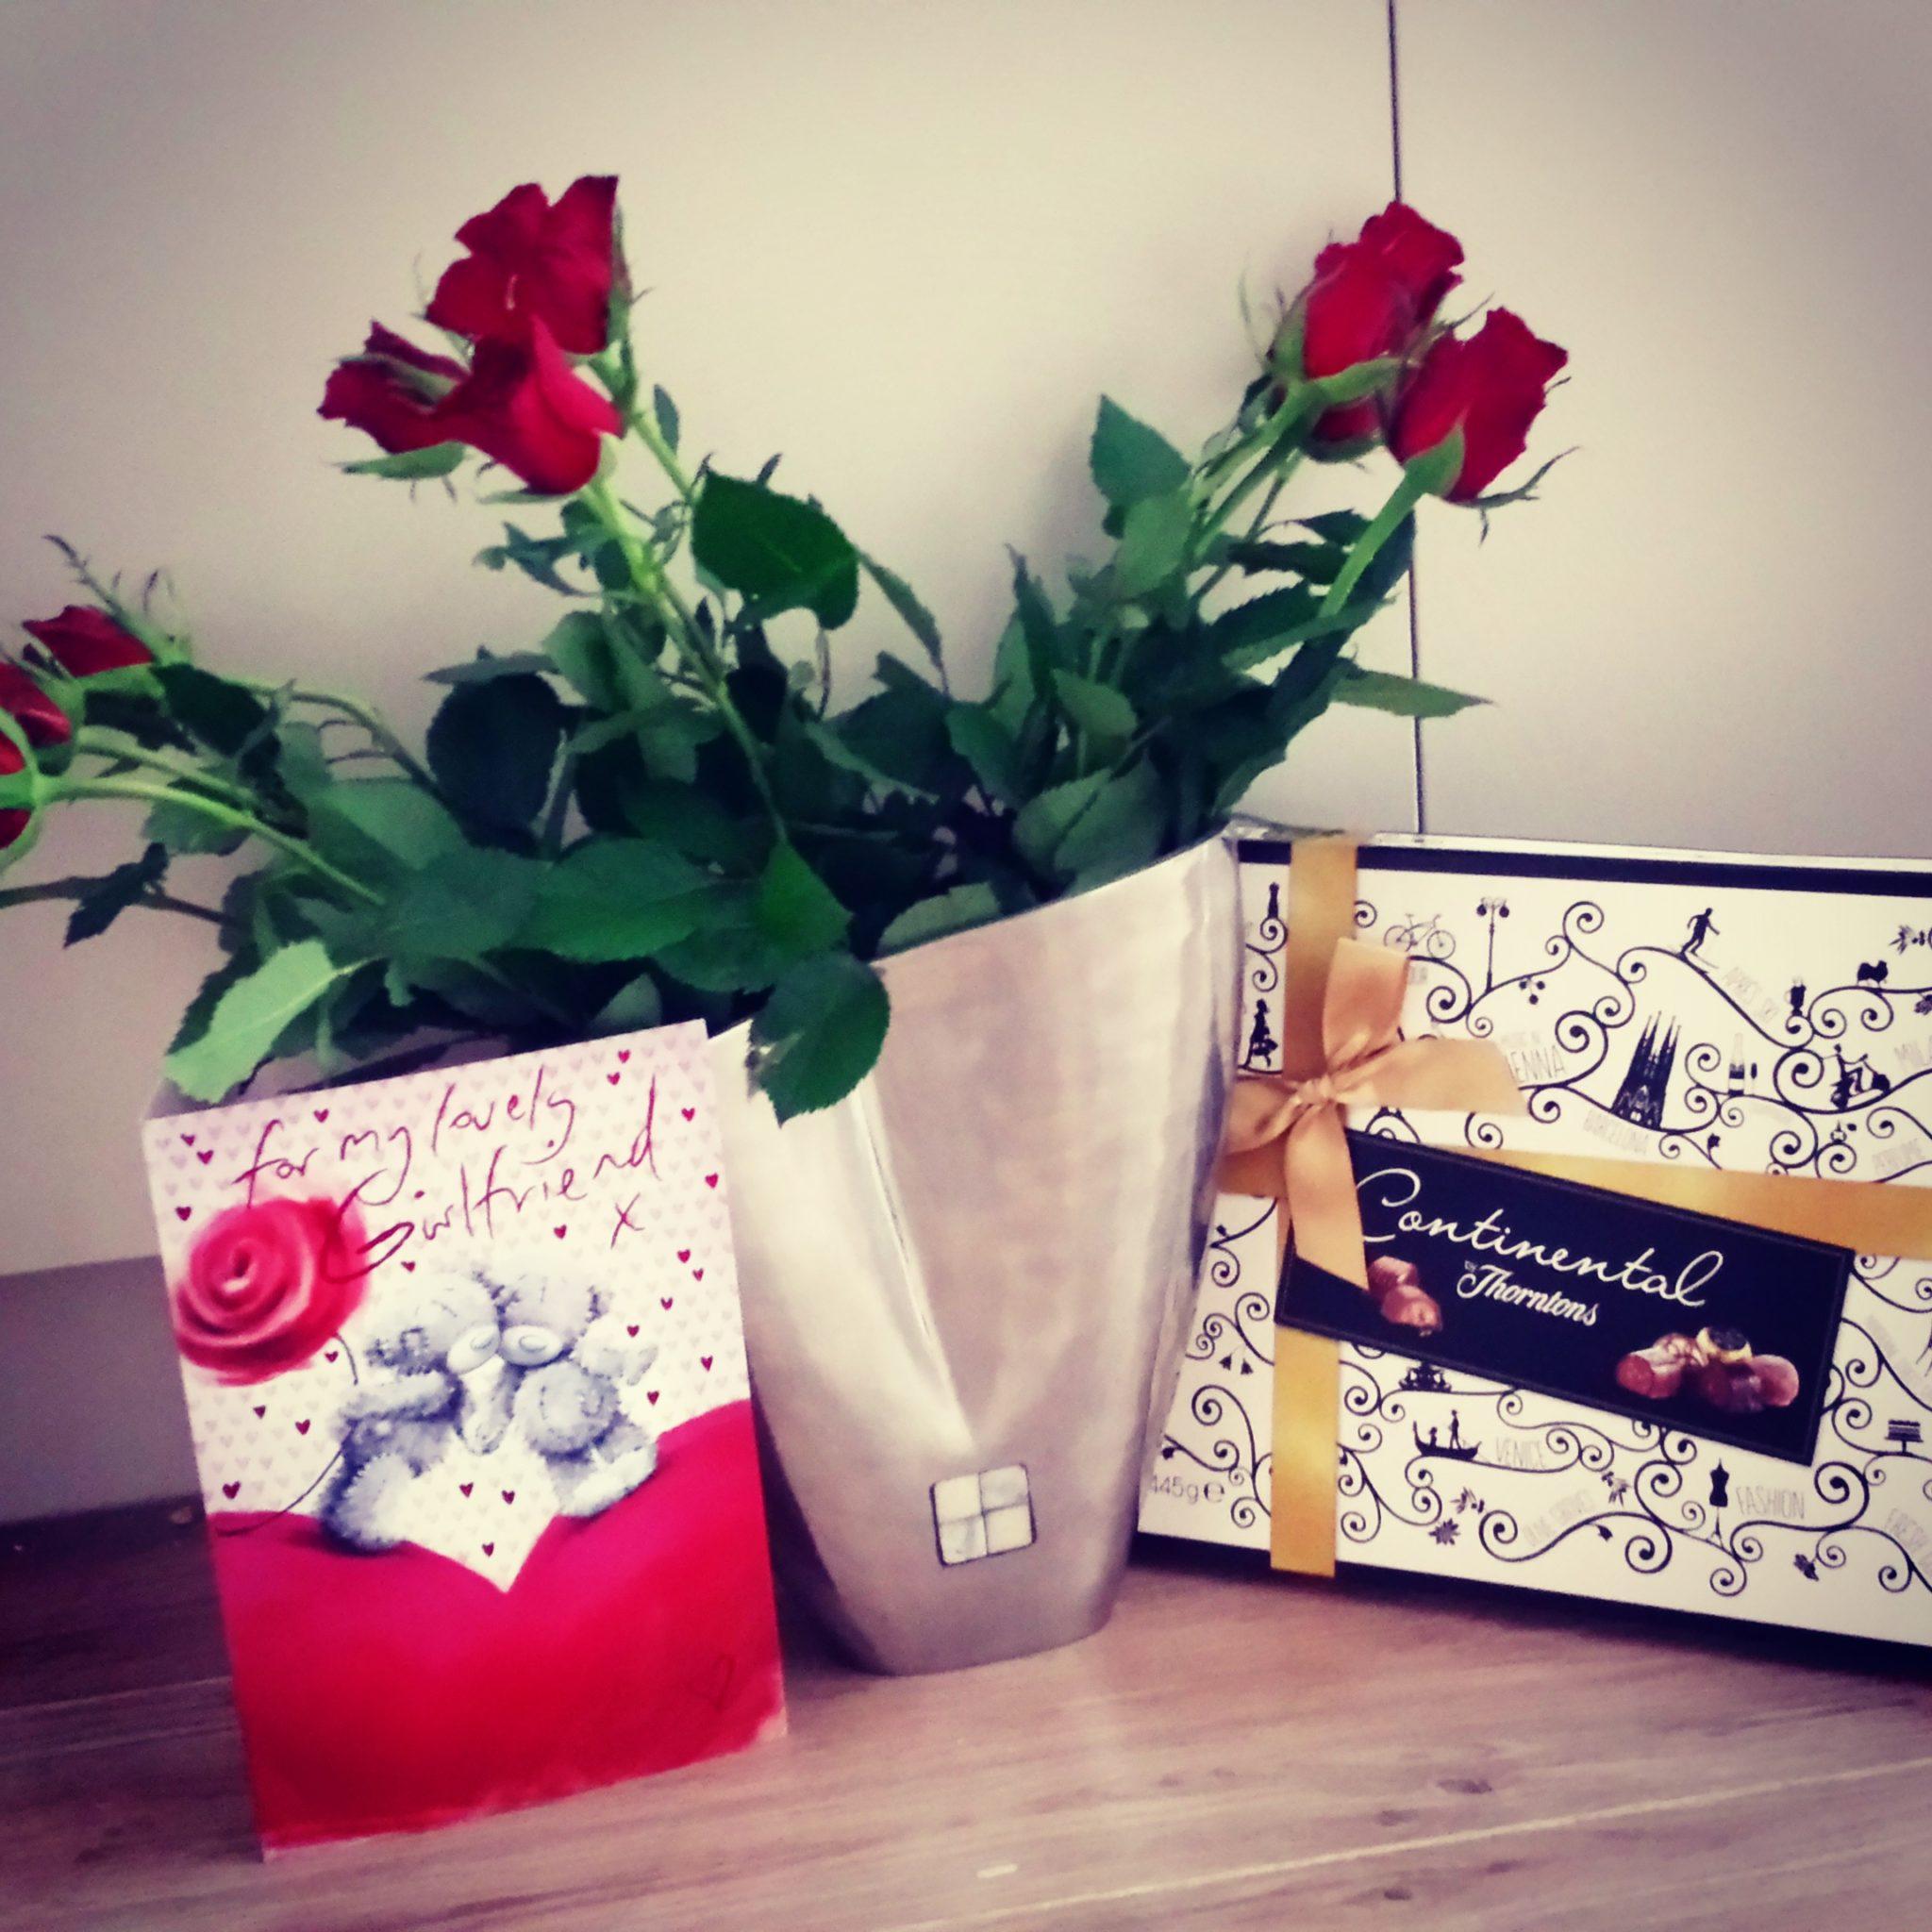 Top 10 Best Ways to Celebrate Valentine's Day in London!